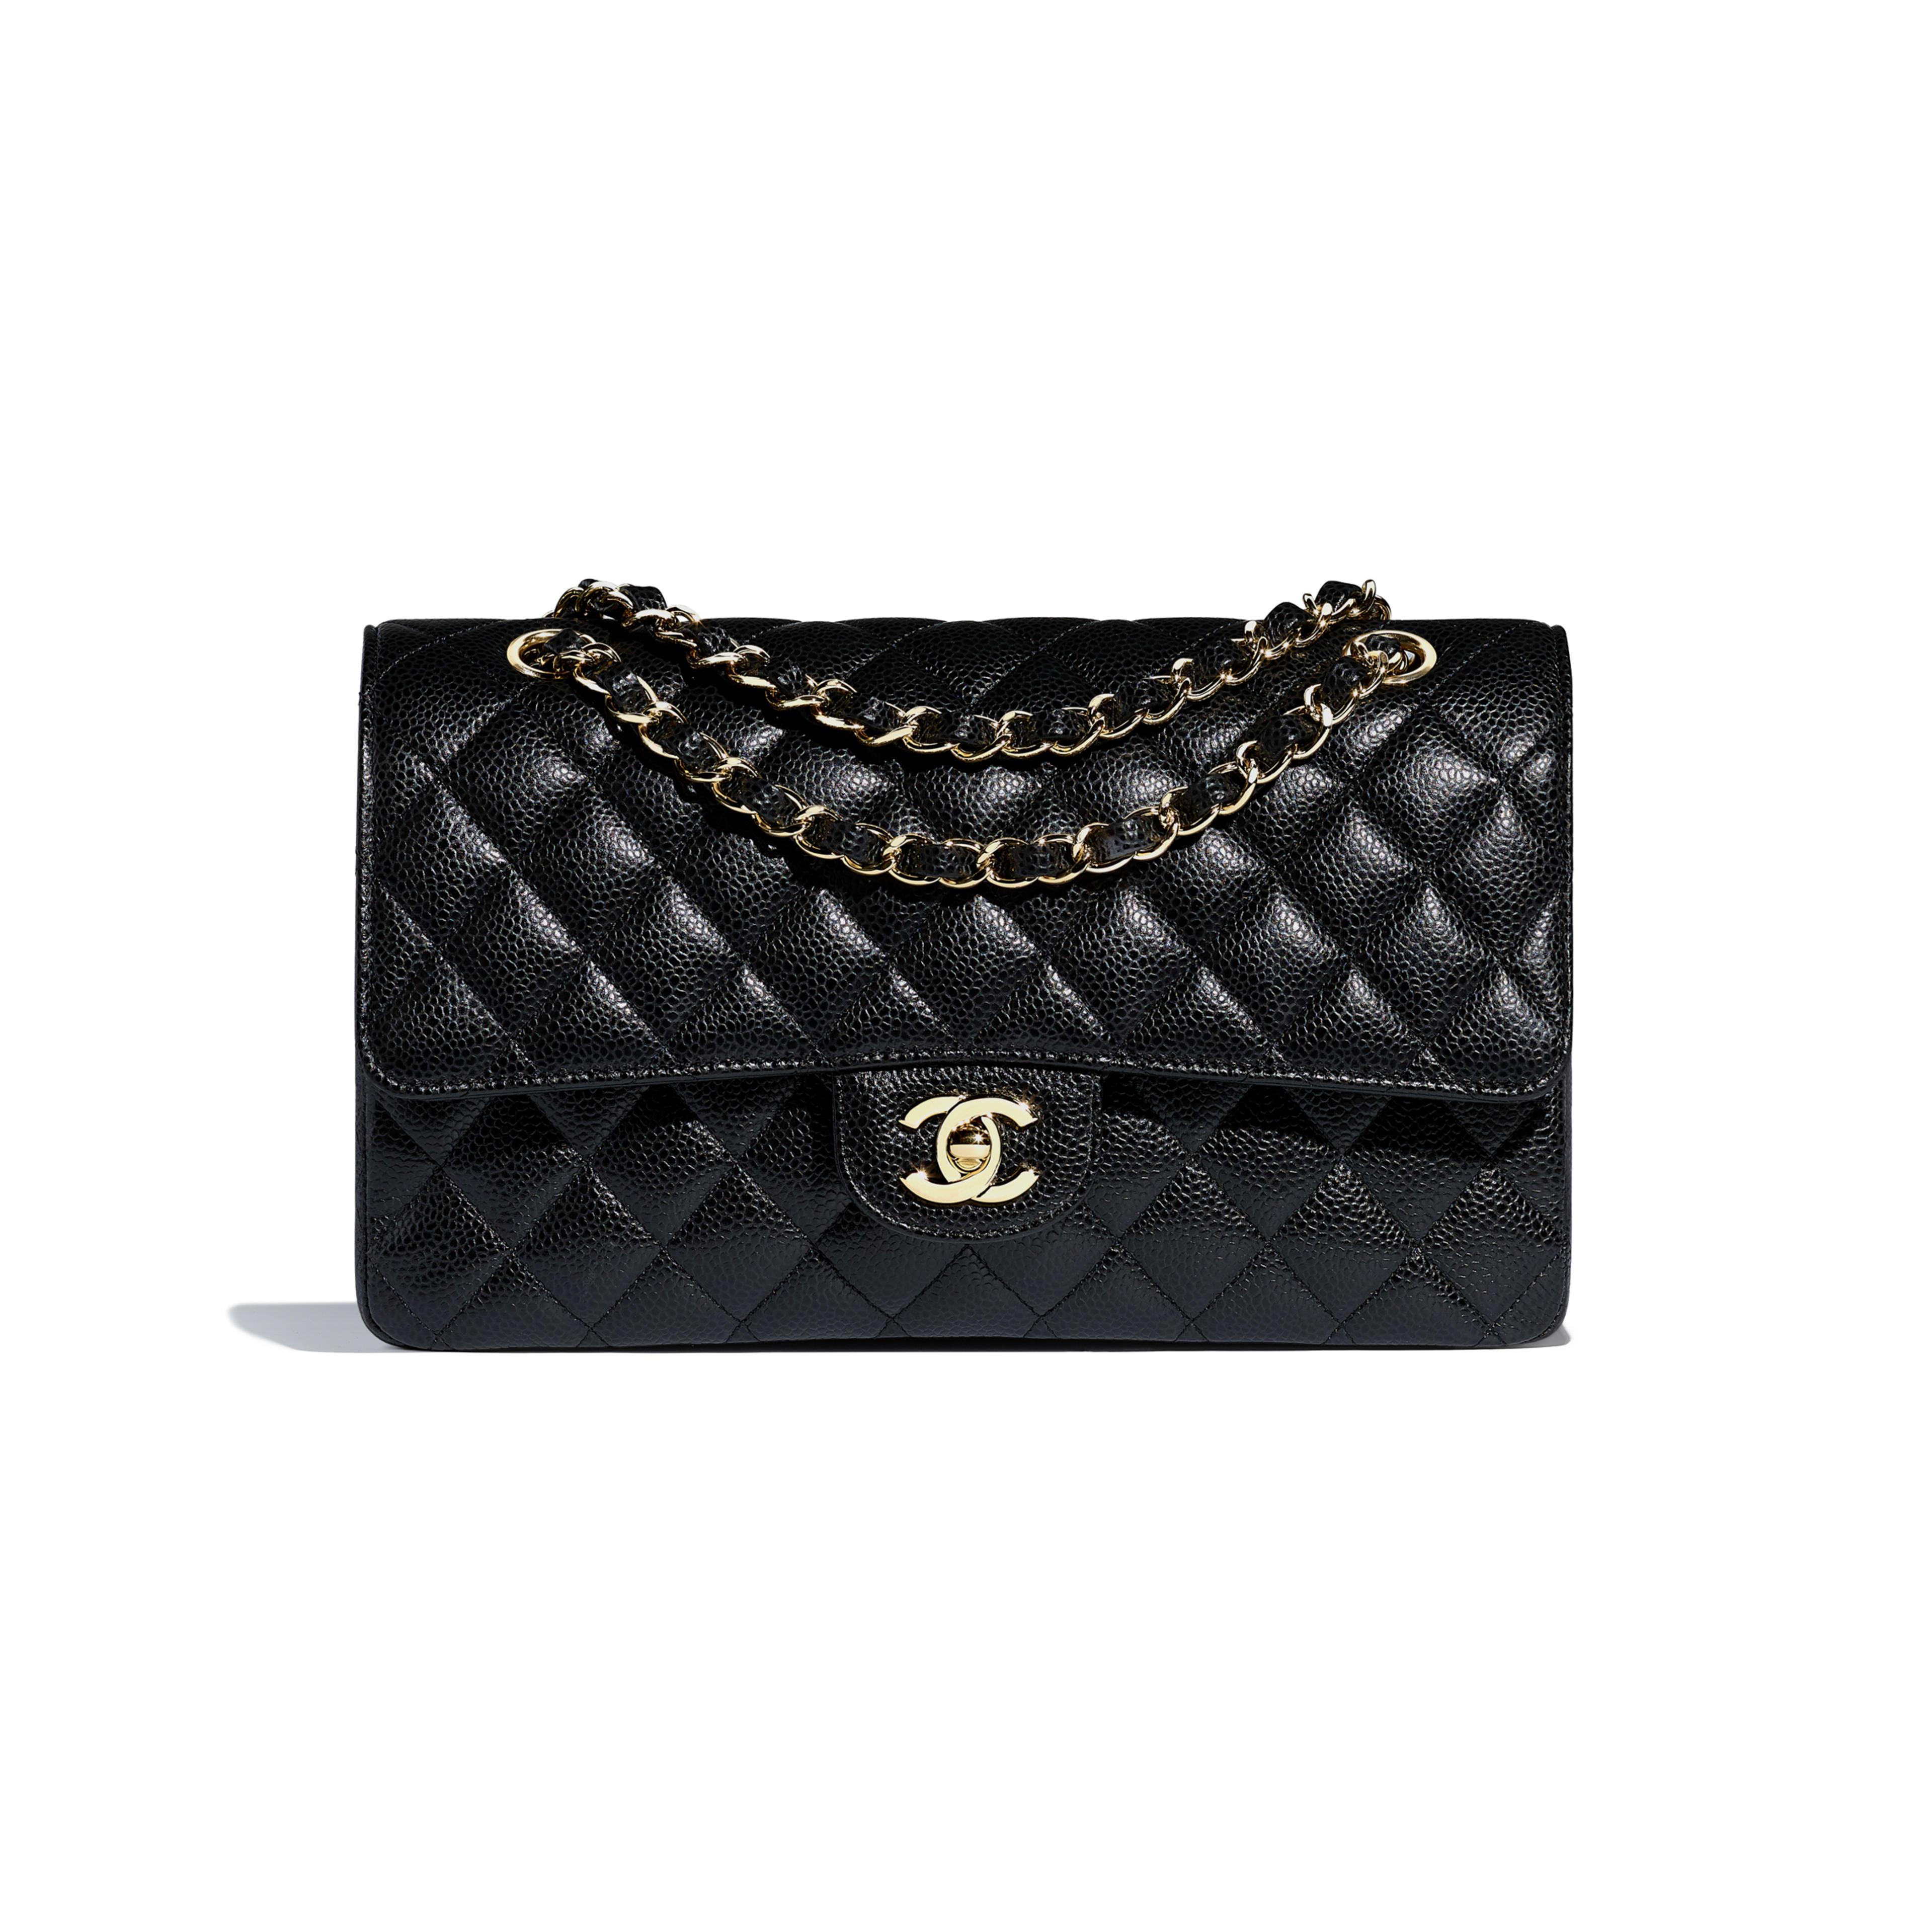 Grained Calfskin & Gold-Tone Metal Black Classic Handbag | CHANEL